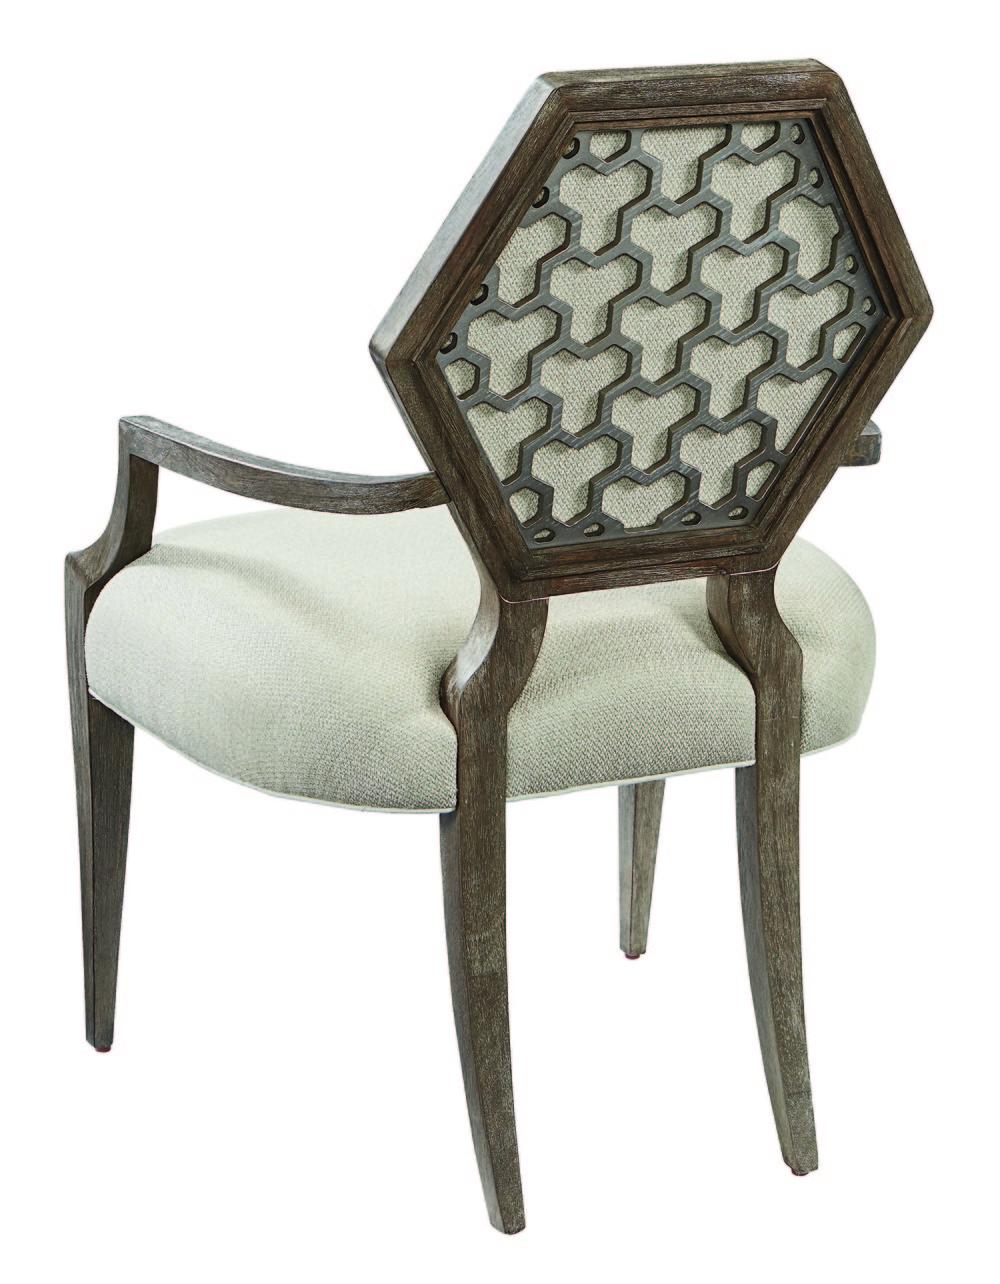 A.R.T. Furniture - Druzy Arm Dining Chair